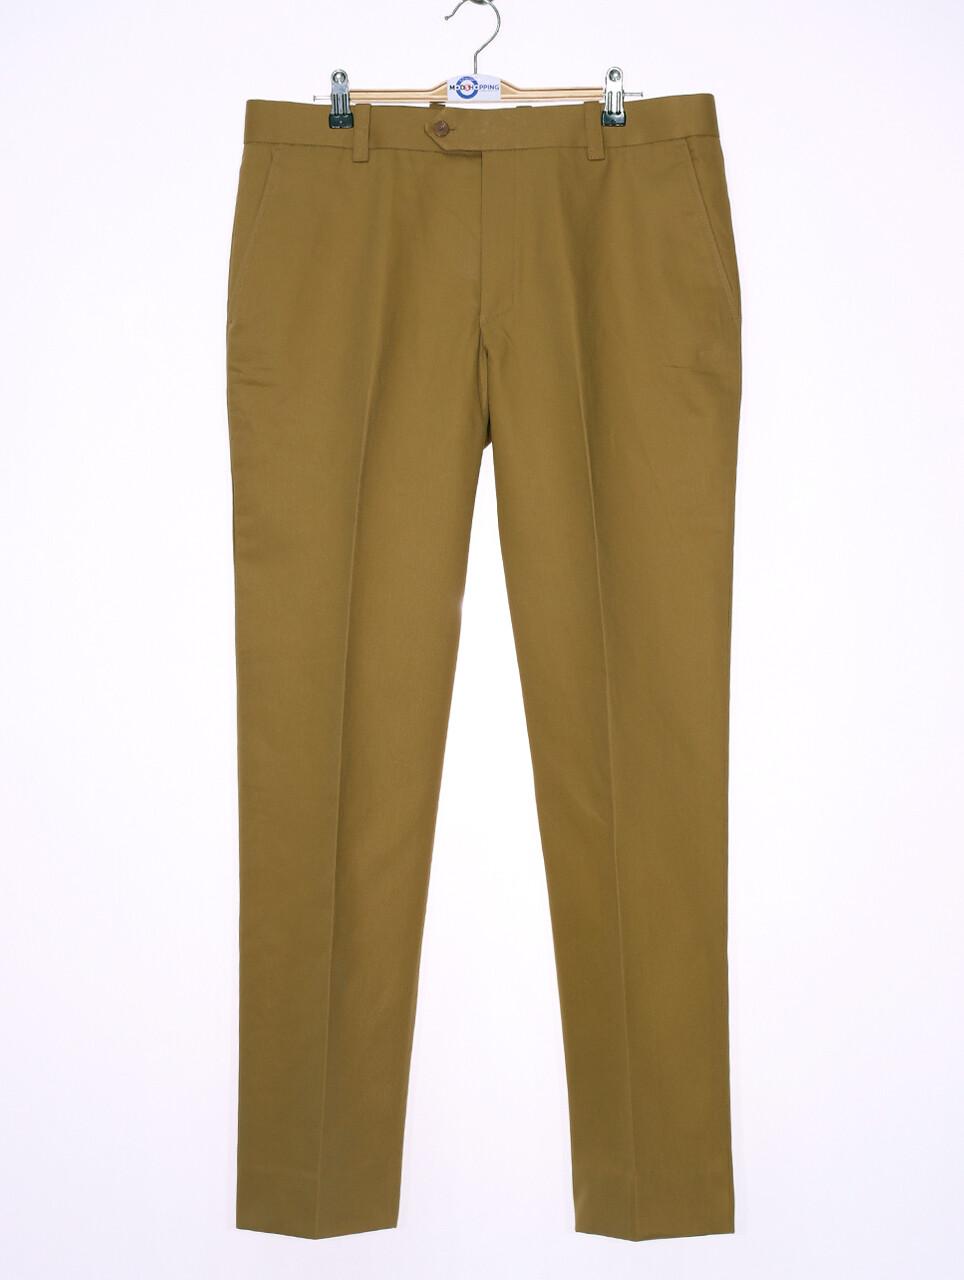 Sta Press Trousers   60s Mod Classic Khaki Men's Trouser